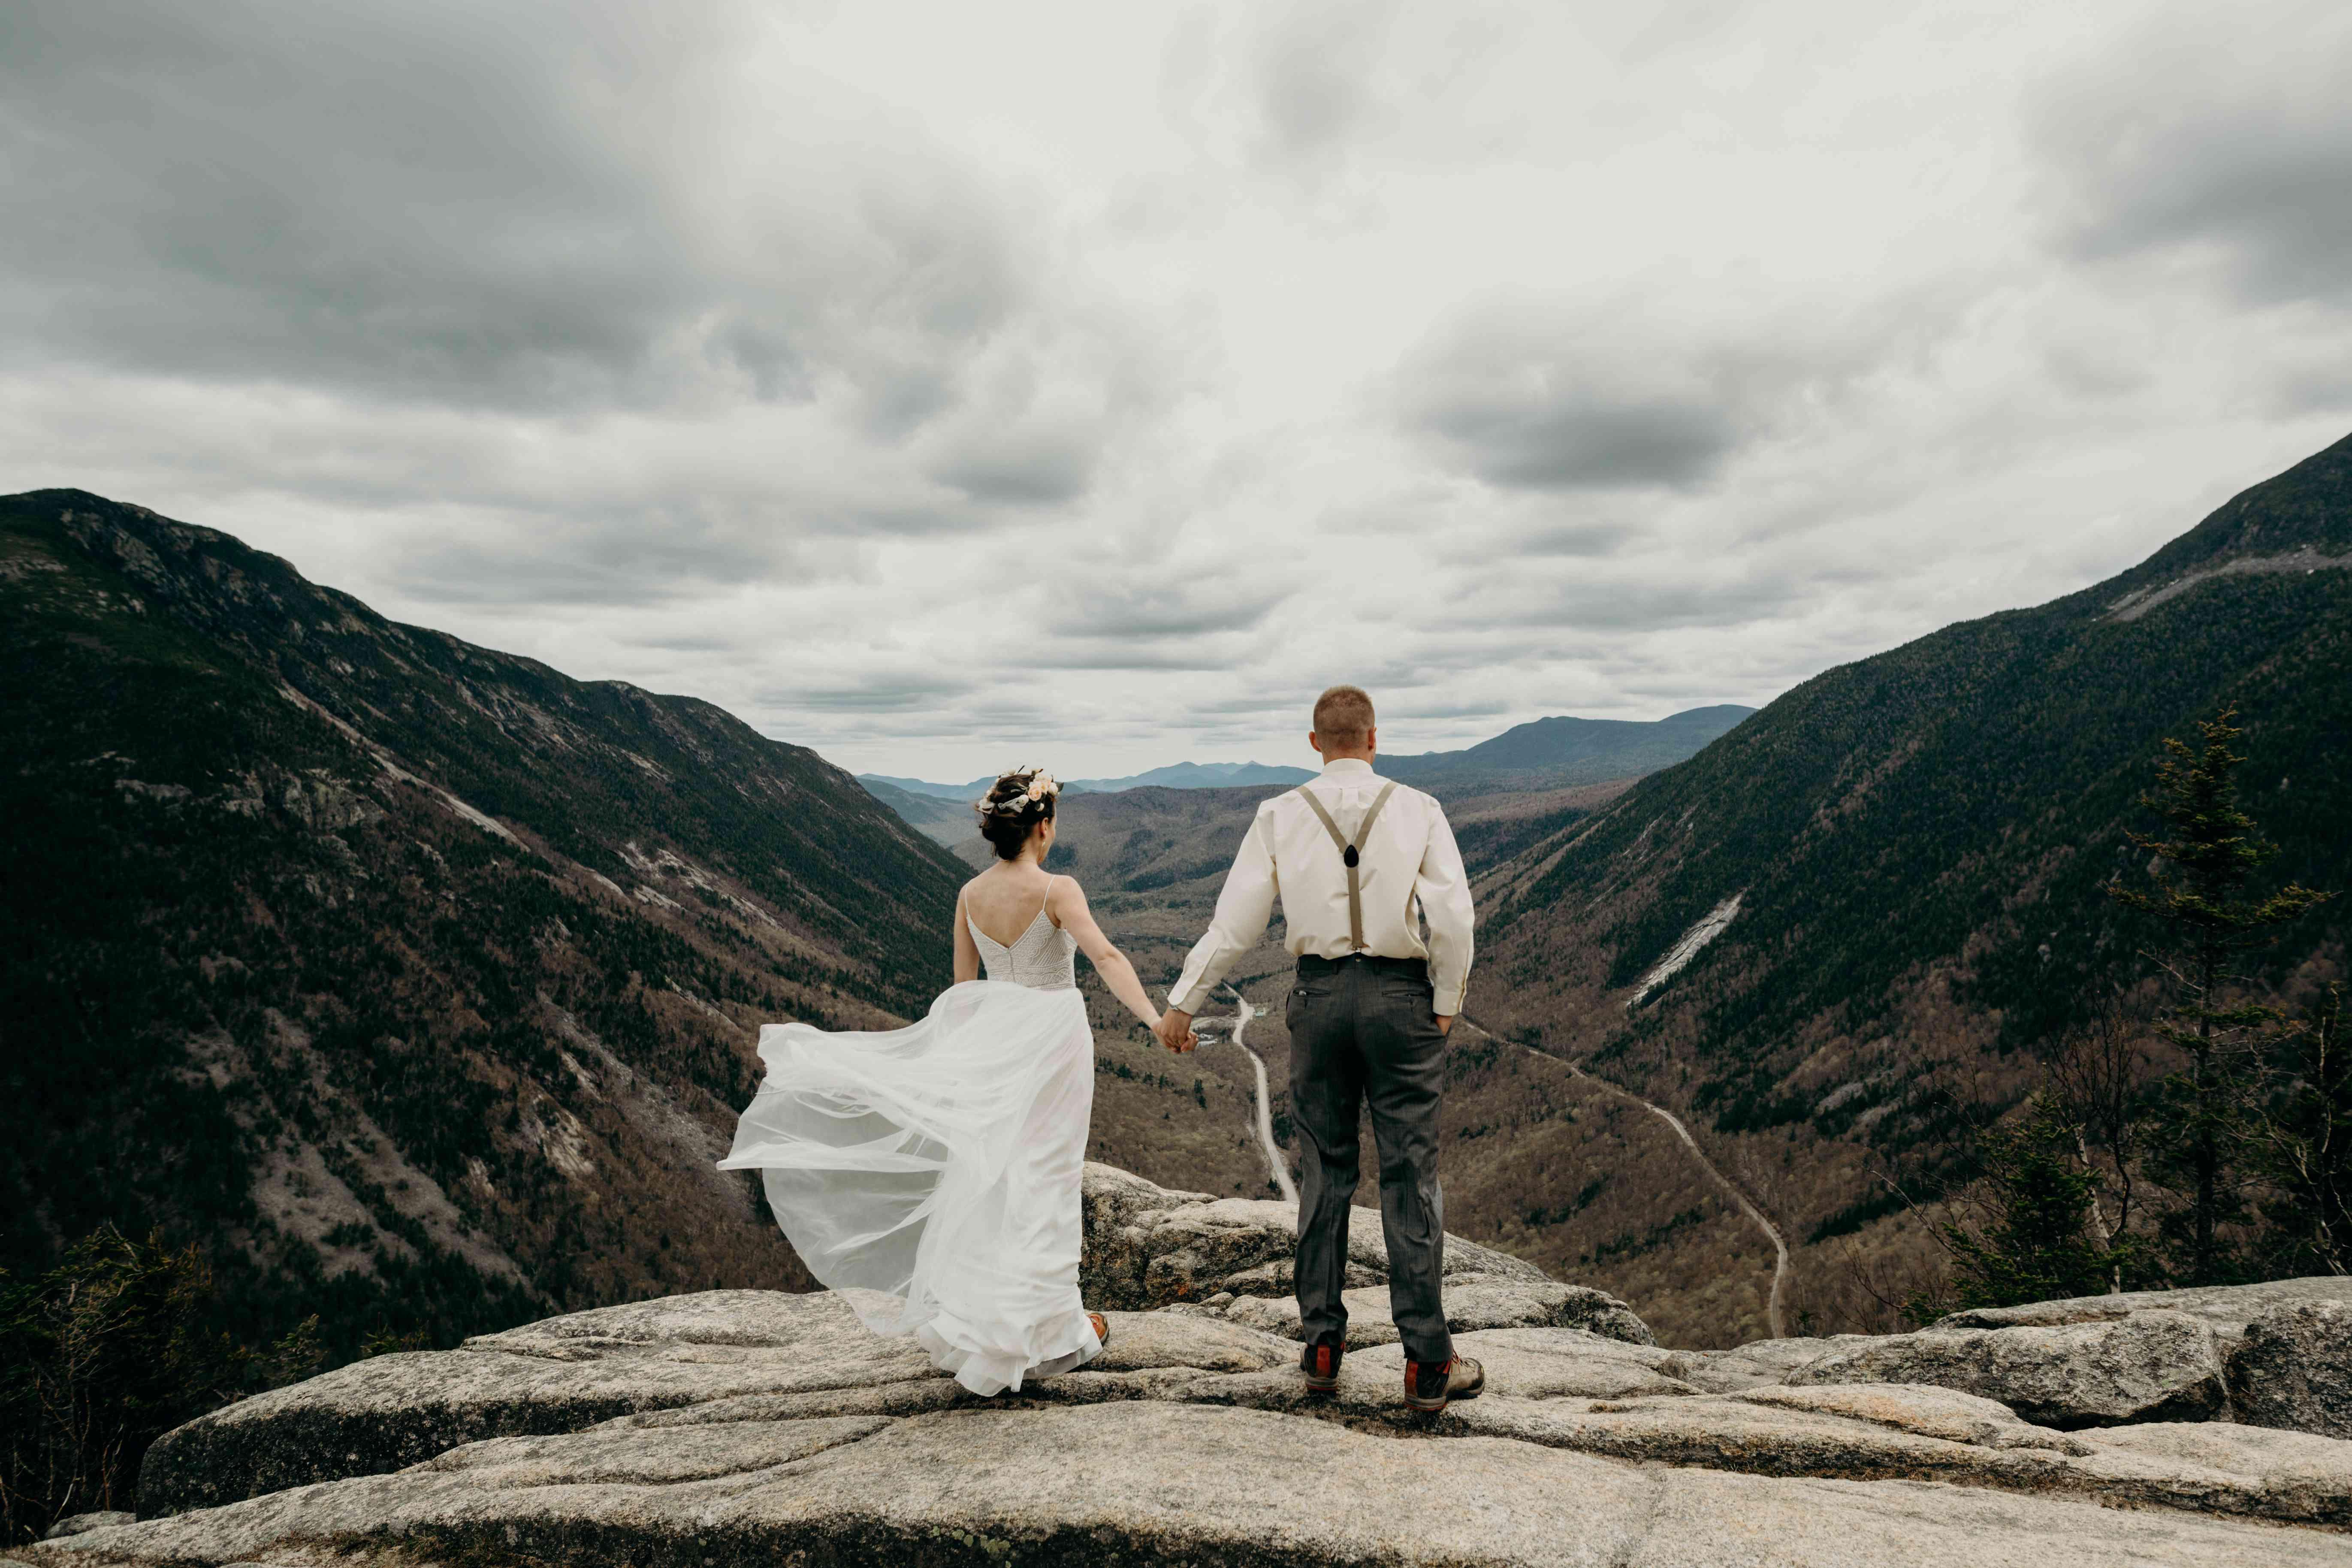 <p>Wedding photo at Mount Willard in New Hampshire</p>